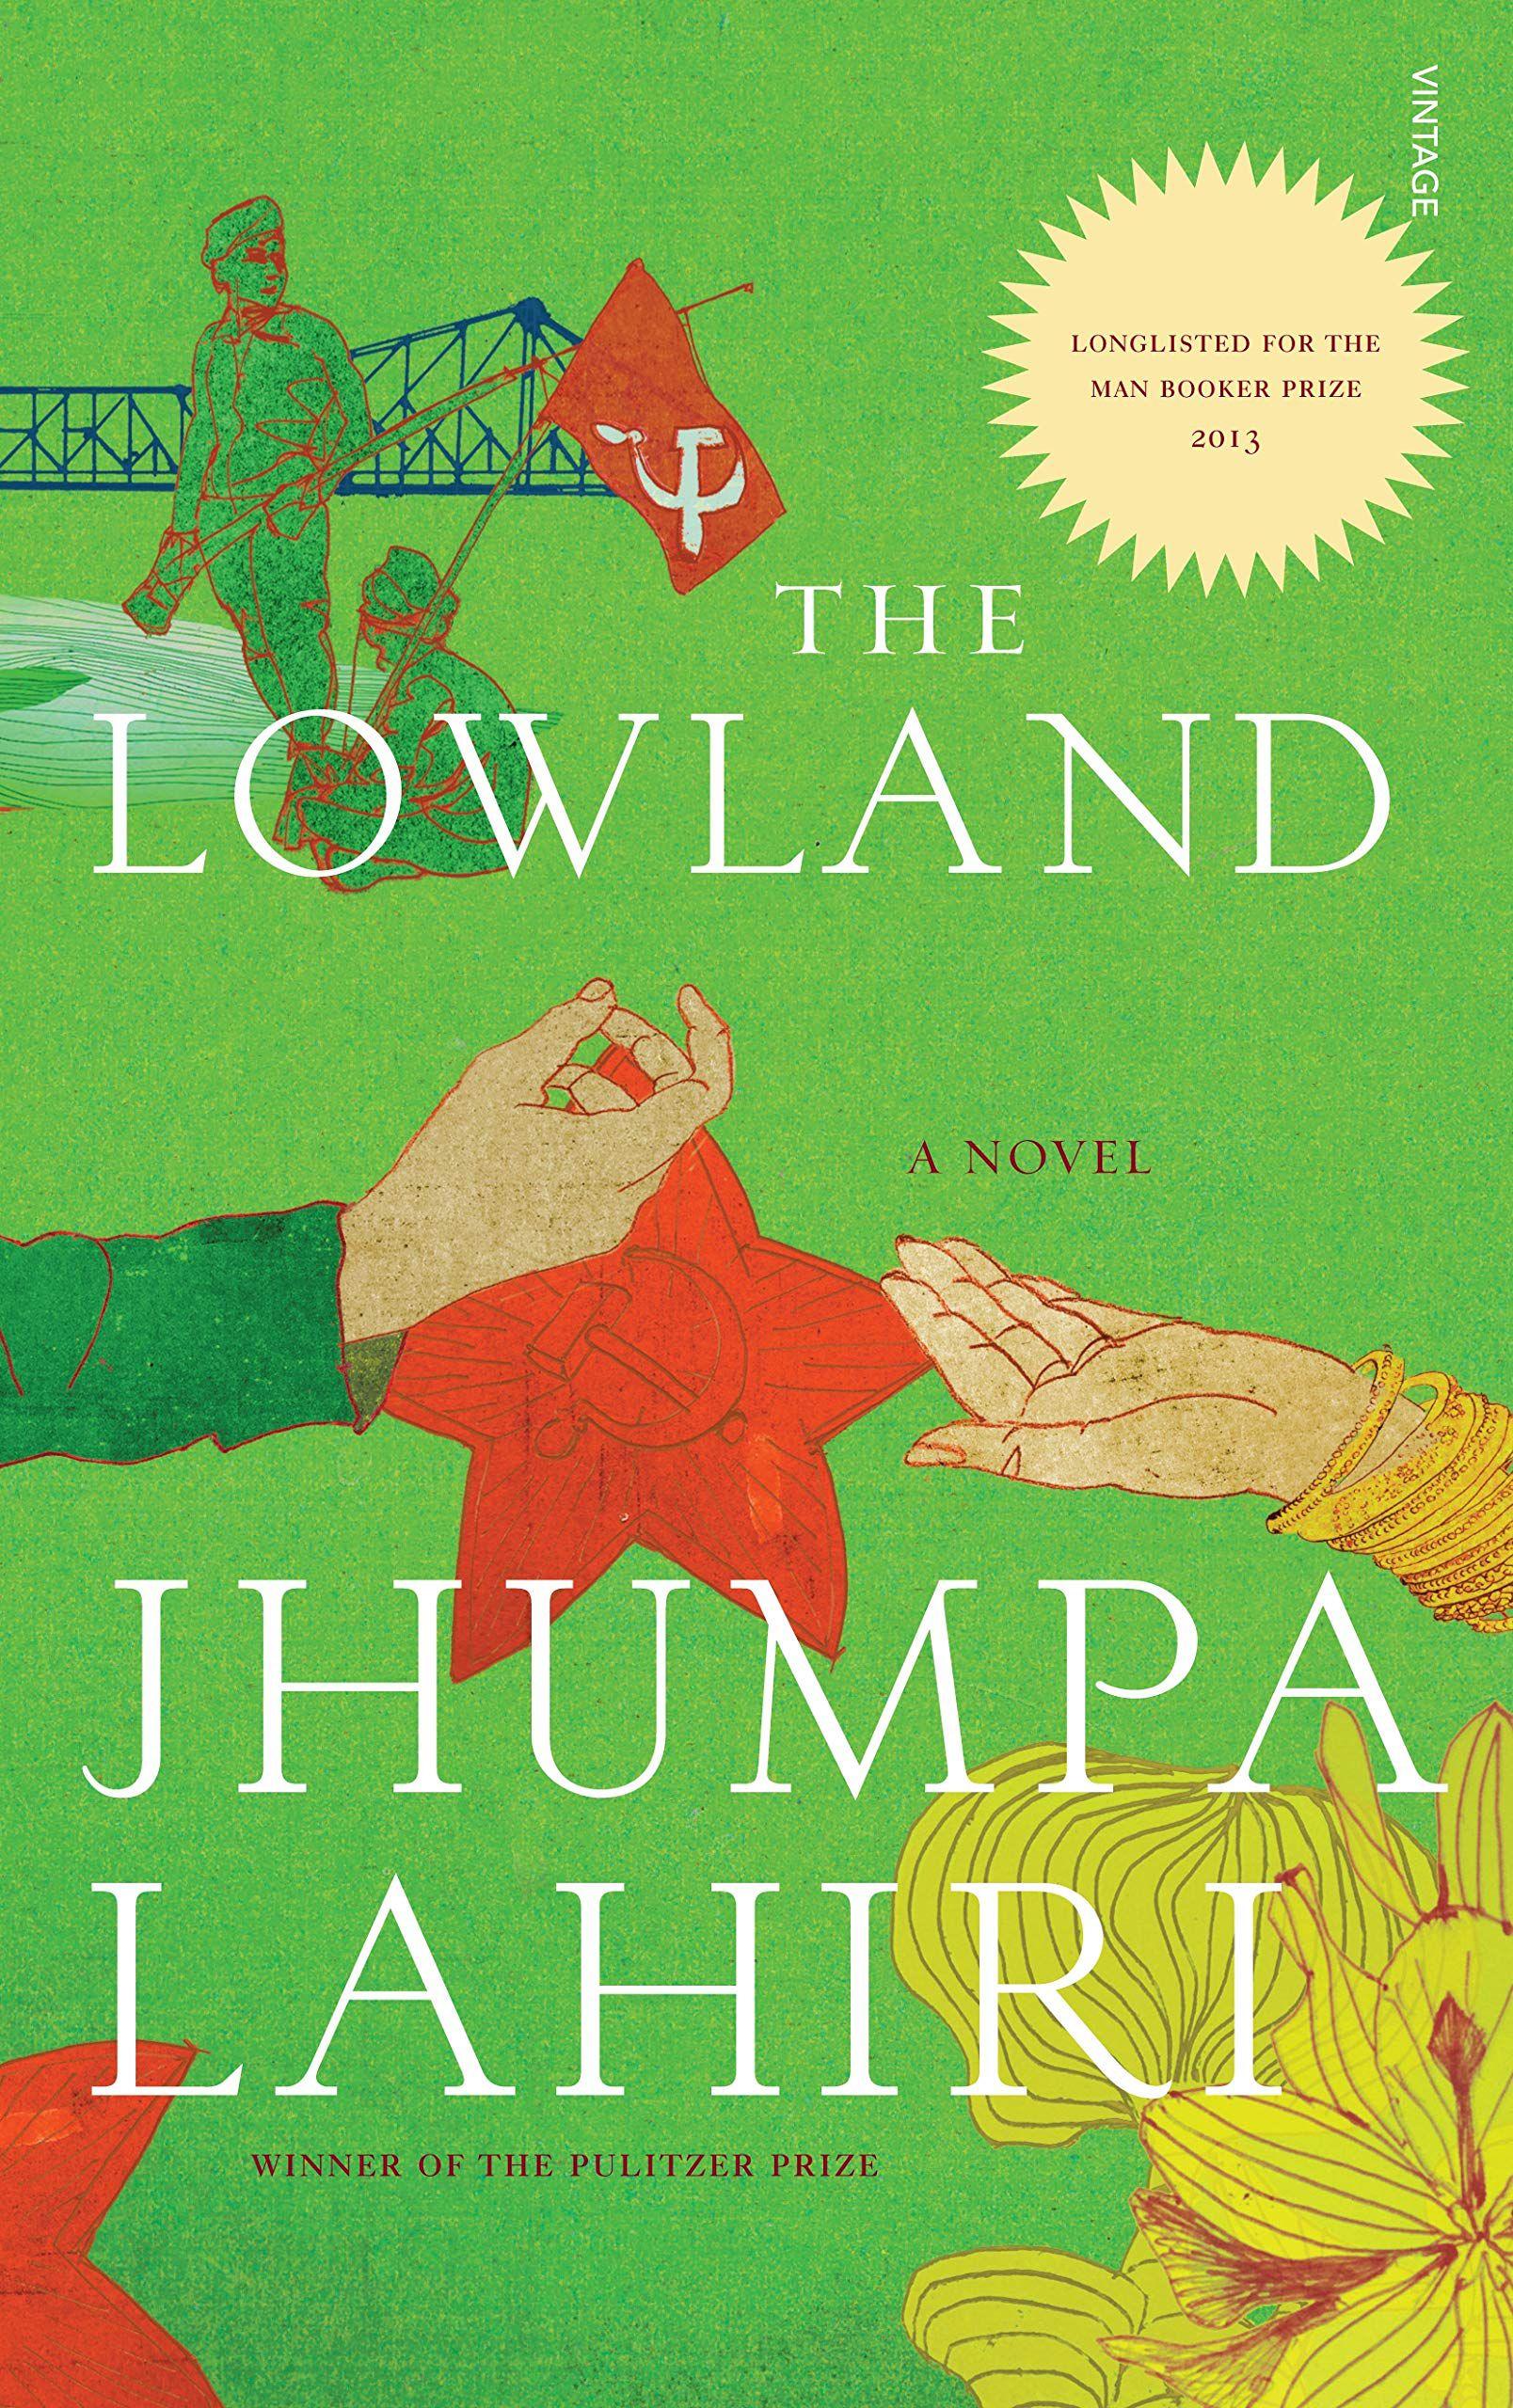 the lowland by jhumpa lahiri book cover.jpg.optimal